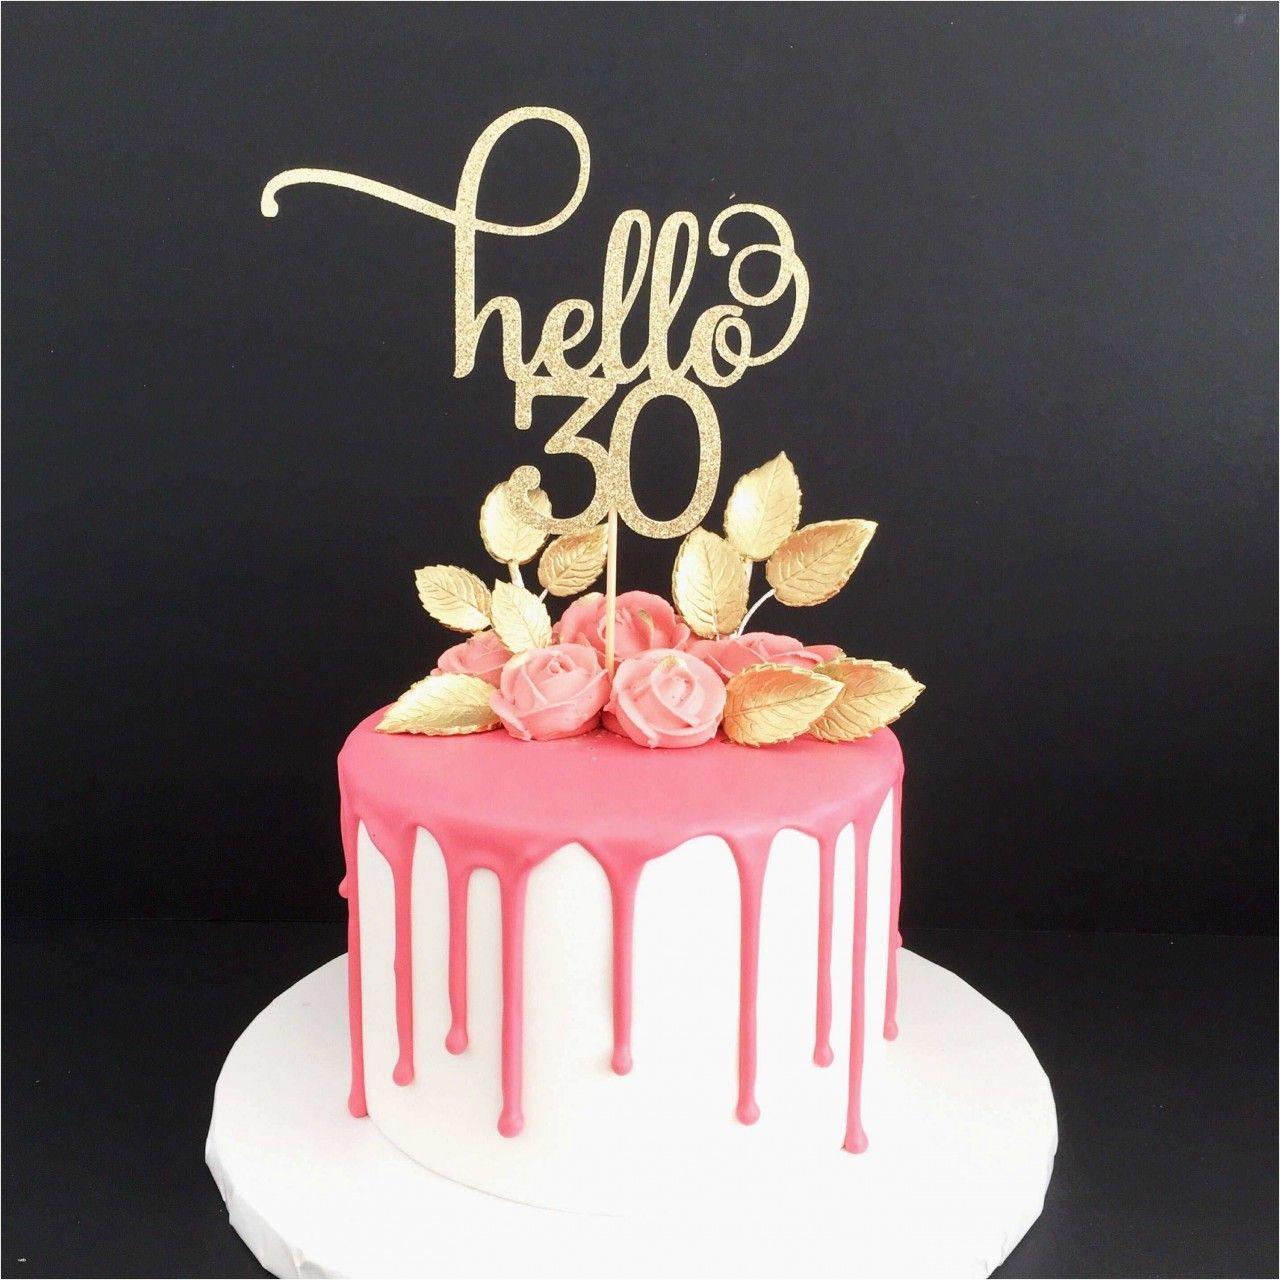 Cool 30Th Birthday Cake Ideas Bolos De Aniversario 30 Funny Birthday Cards Online Fluifree Goldxyz